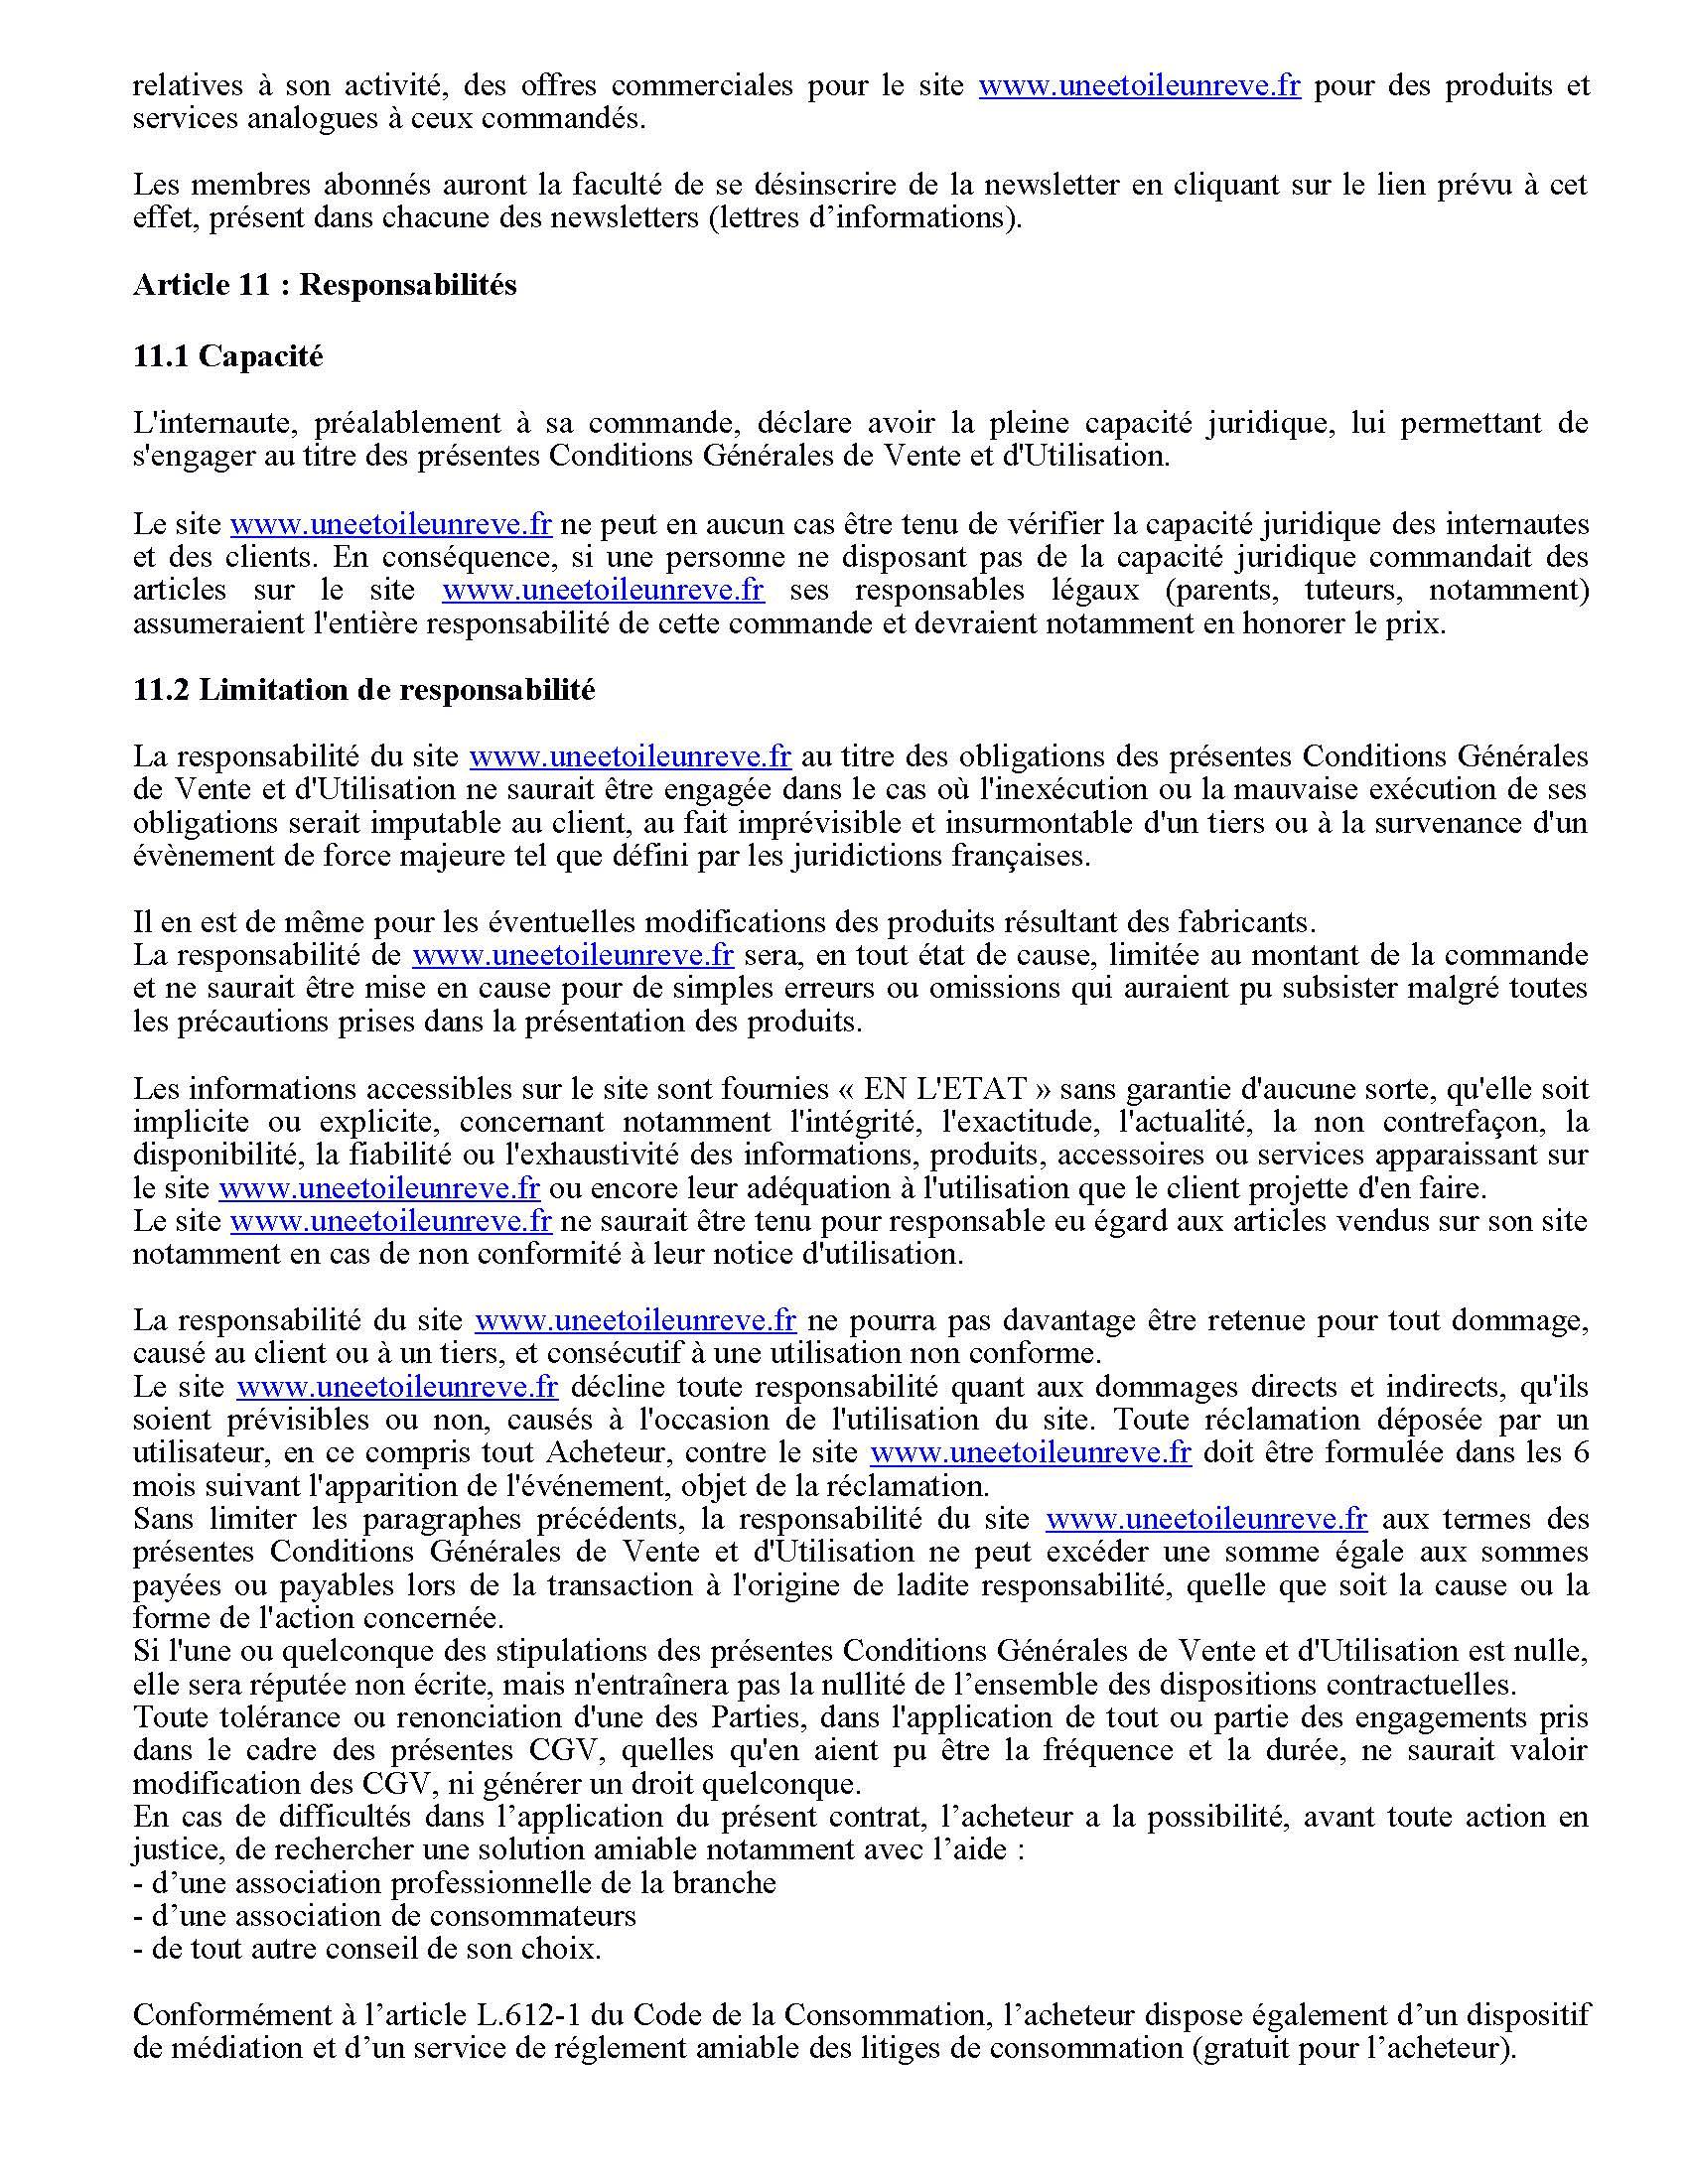 CGV_www.uneetoileunreve.fr_Page_13.jpg